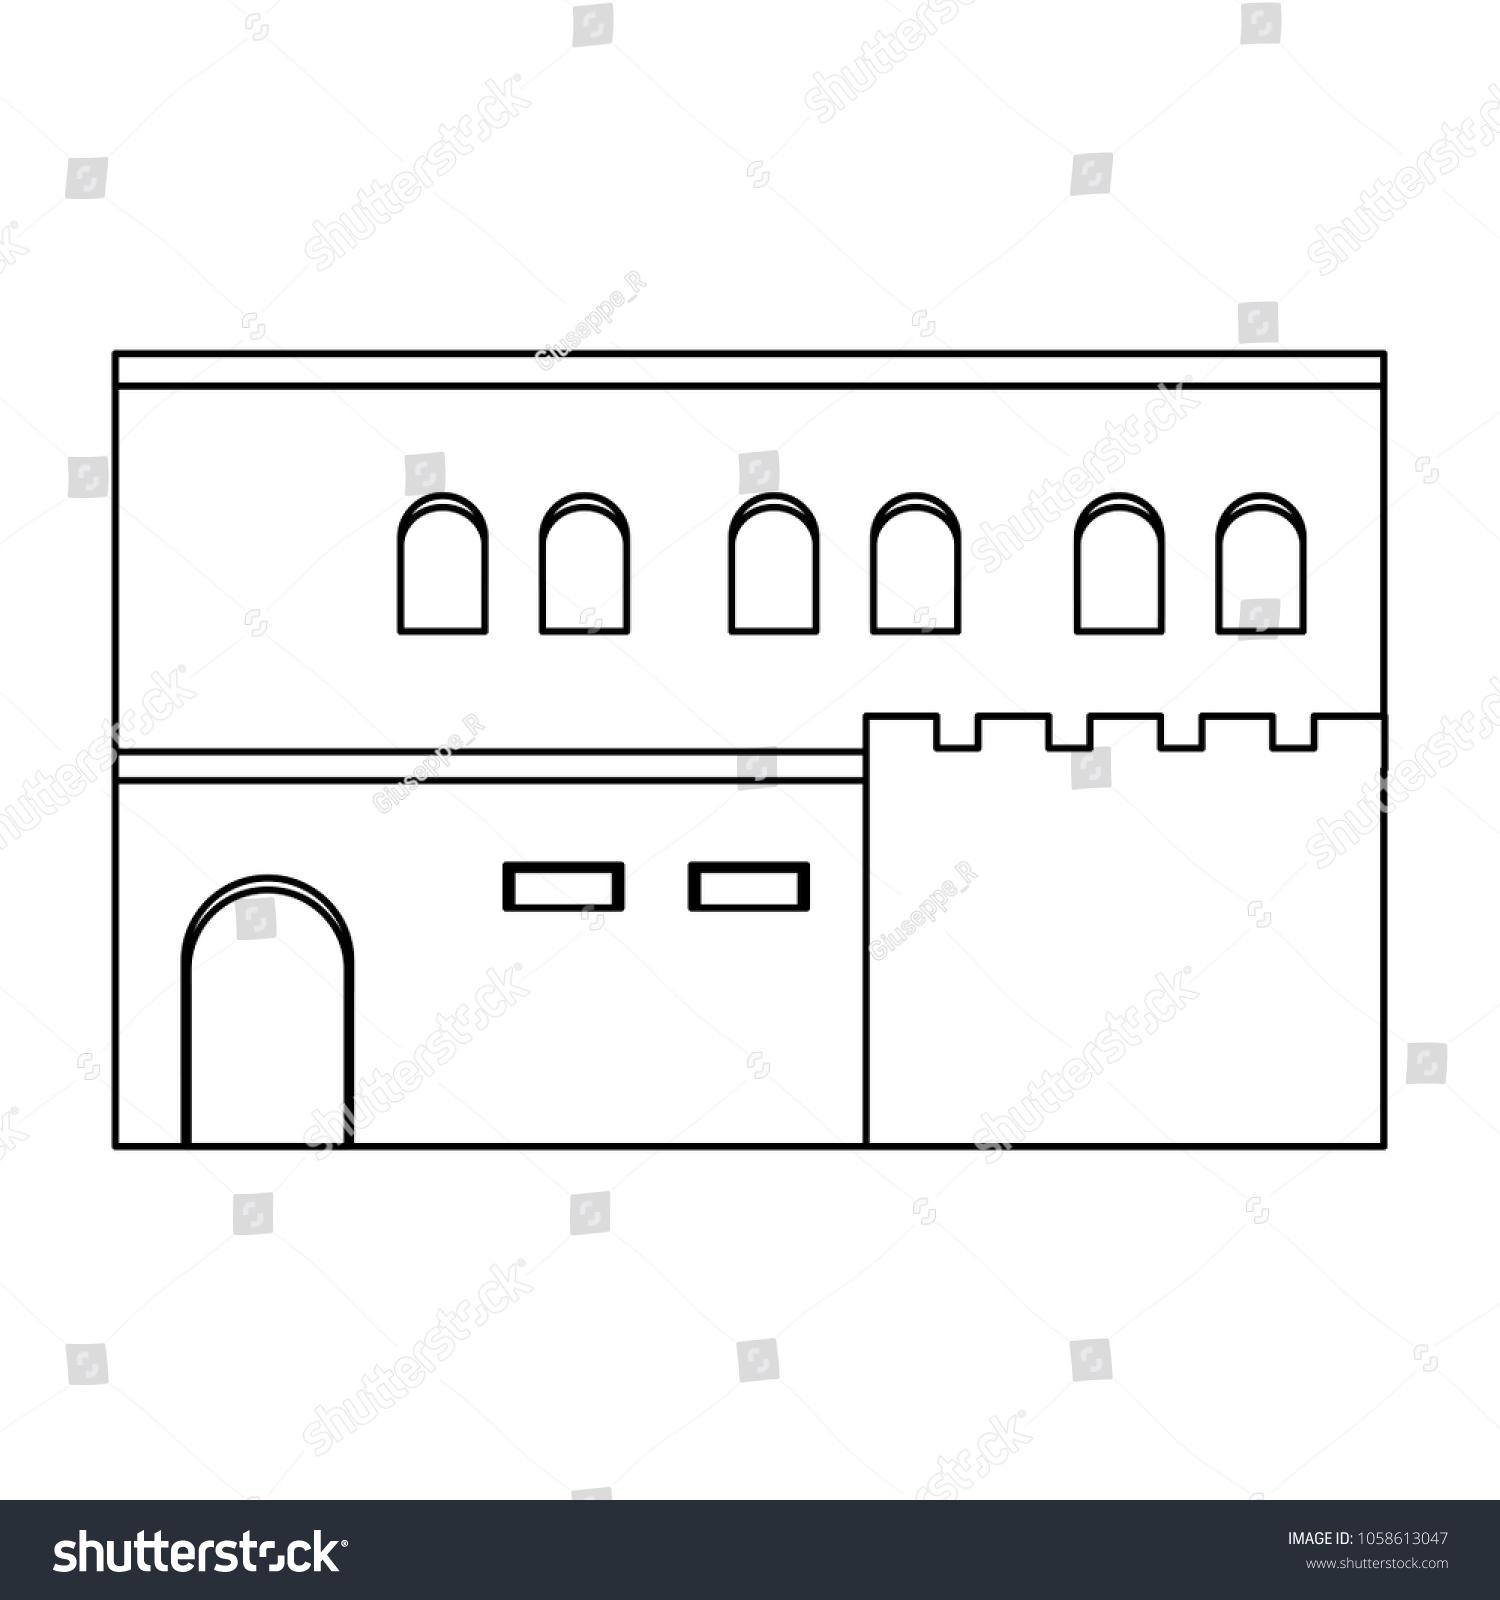 Line Arabic House Windows Door Design Stock Vector Royalty Free. Line Arabic House With Windows And Door Design. Wiring. A Diagram Of A House Arabic At Scoala.co